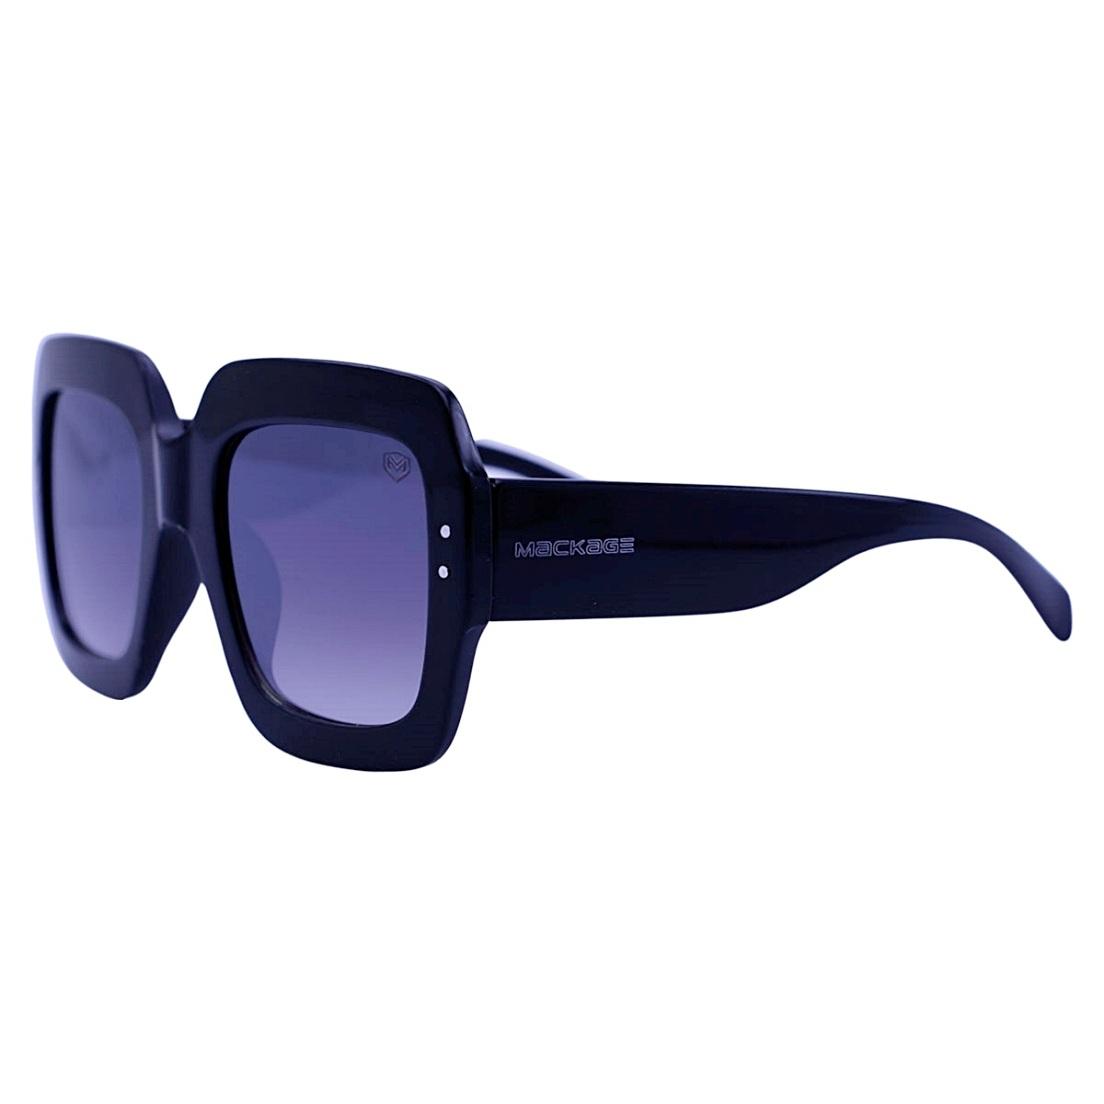 Óculos De Sol Mackage Feminino Acetato Oversize Quadrado - Preto